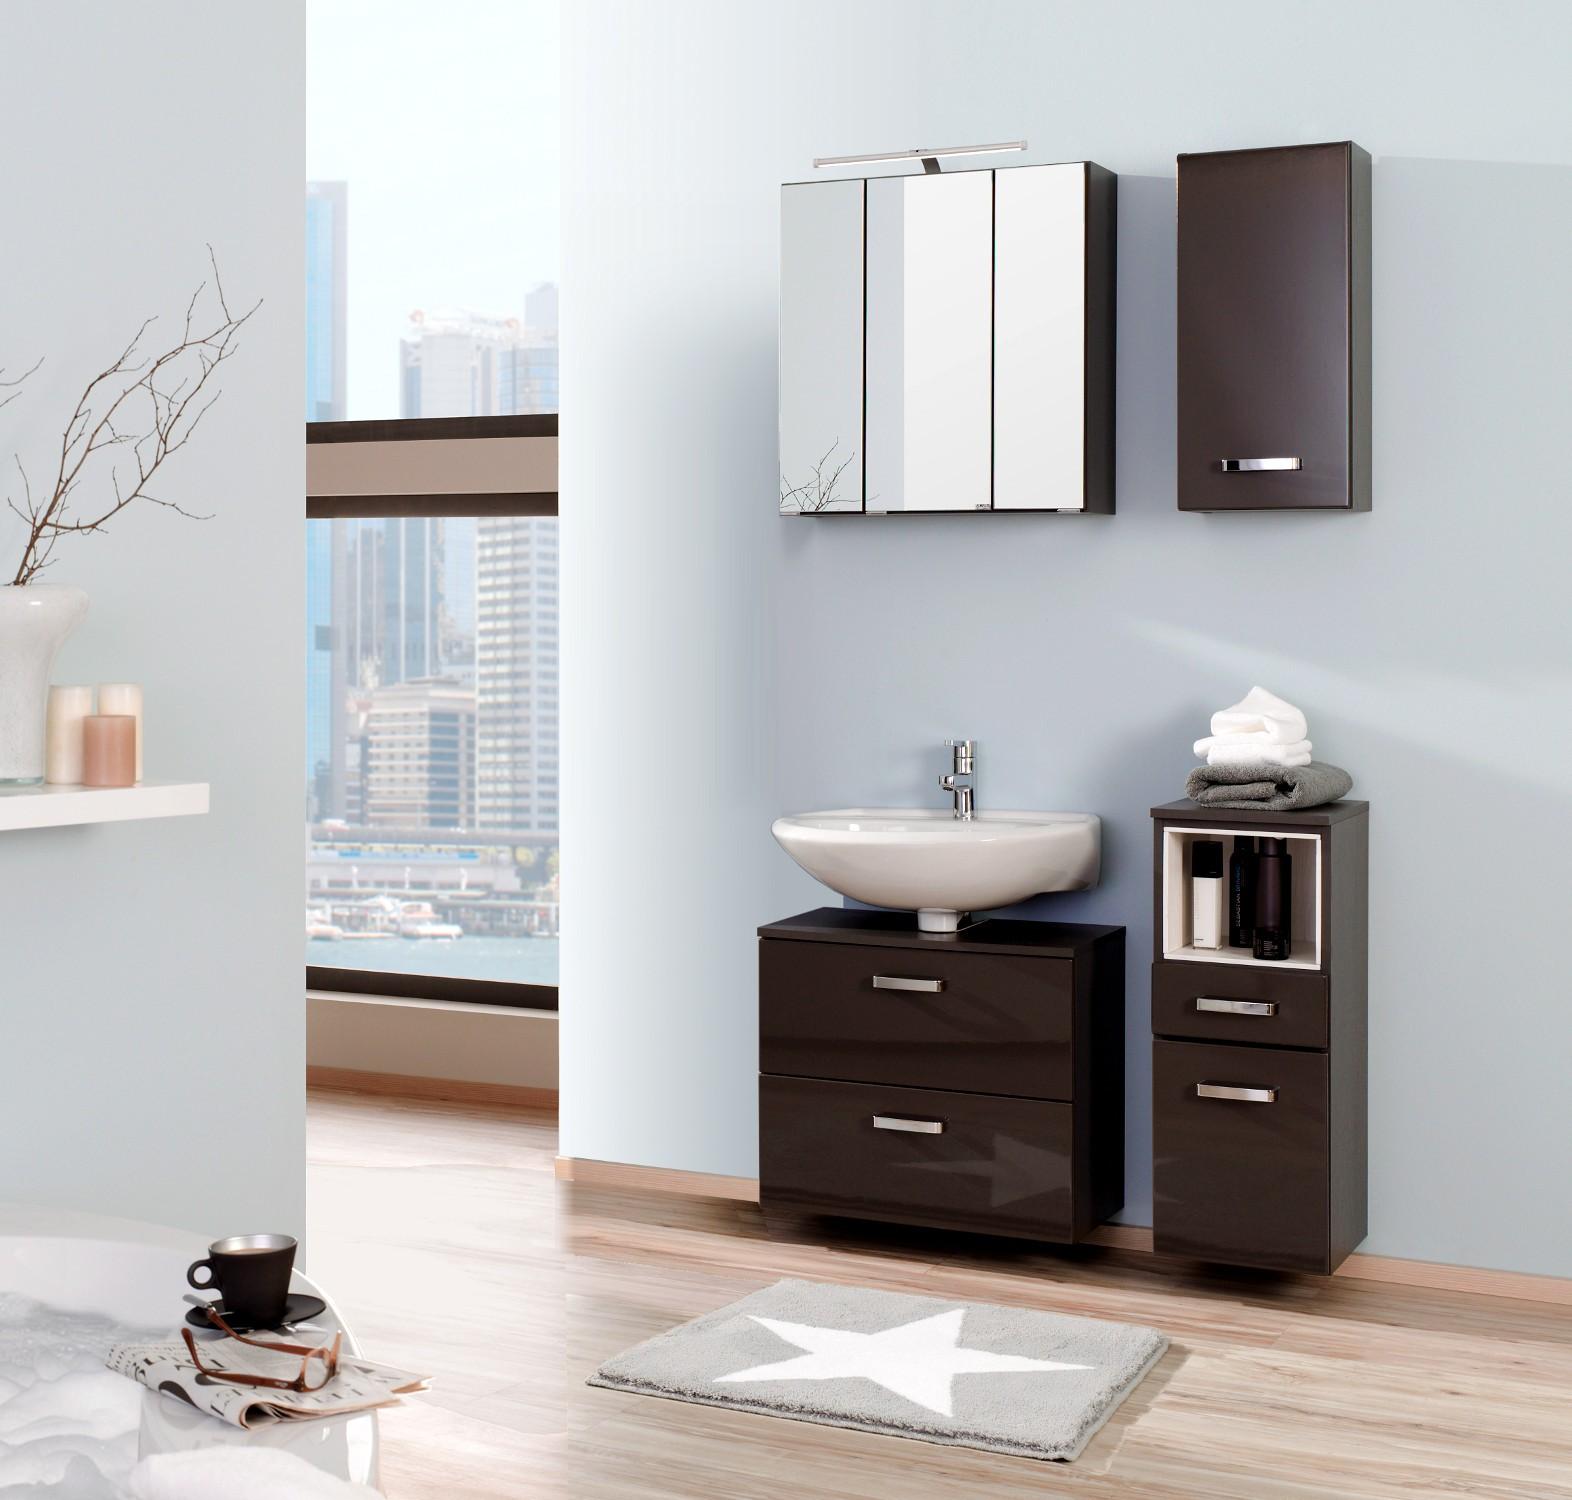 badm bel hochglanz grau hx61 kyushucon. Black Bedroom Furniture Sets. Home Design Ideas